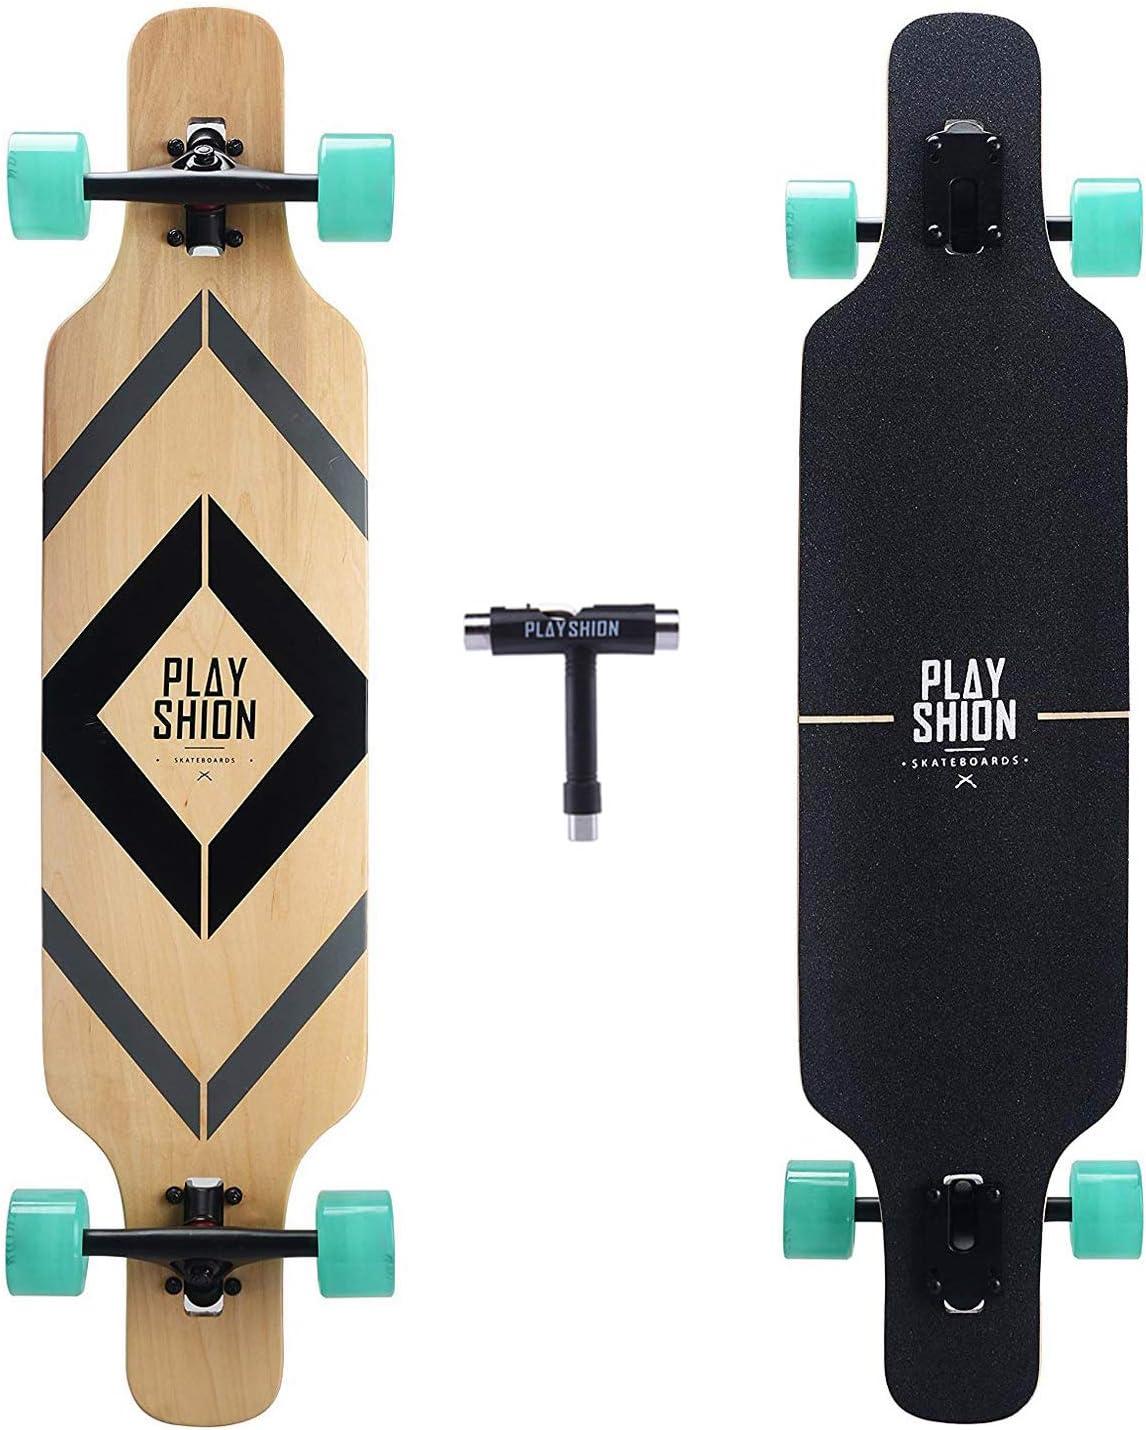 Playshion Freestyle Longboard